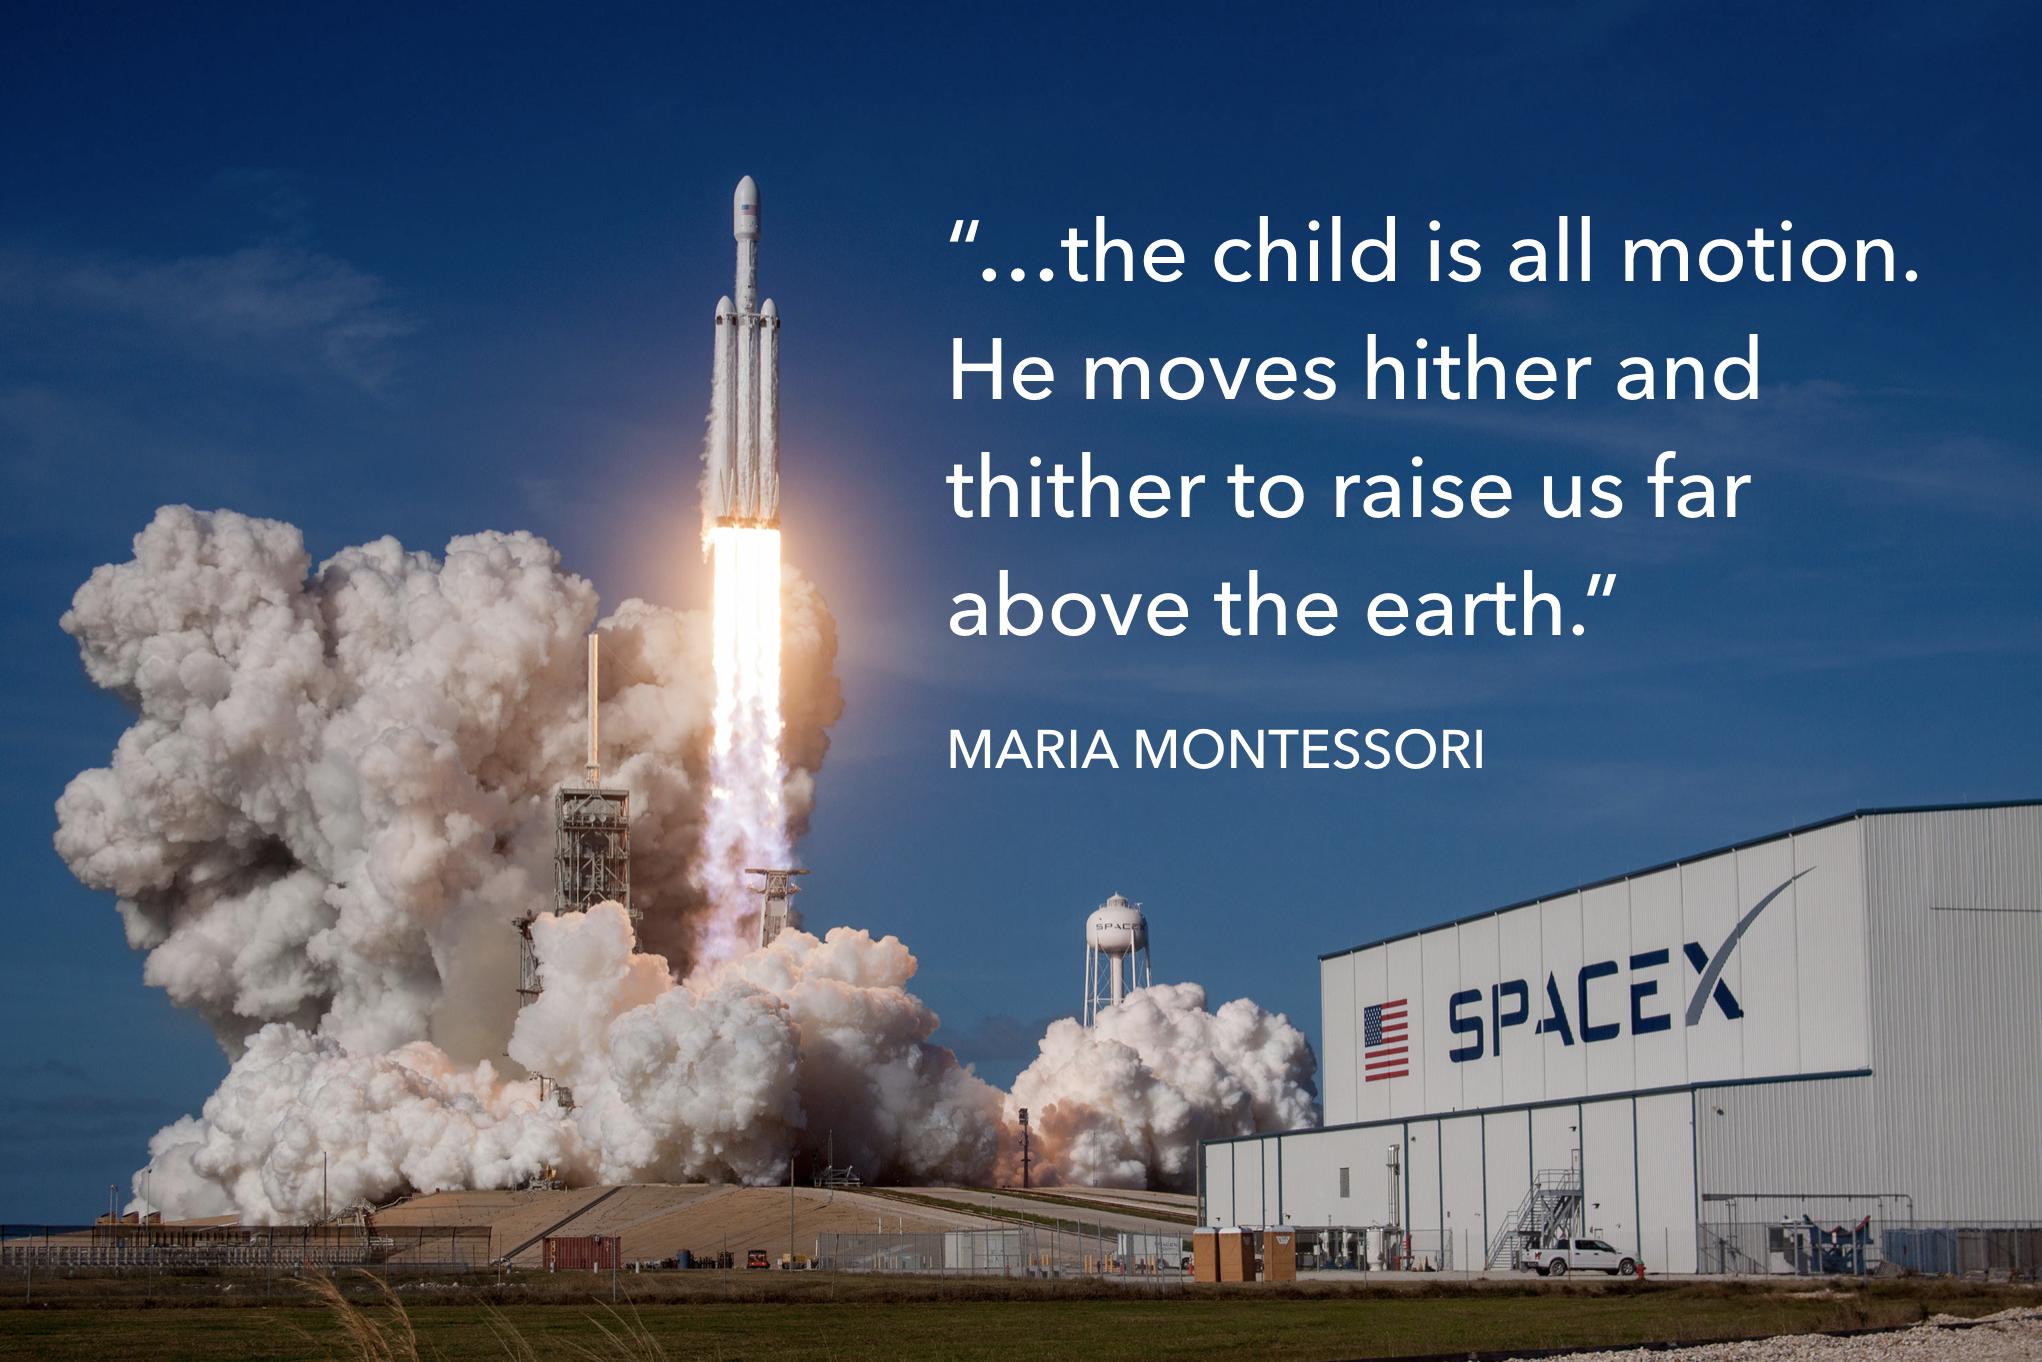 Montessori_SpaceX.png